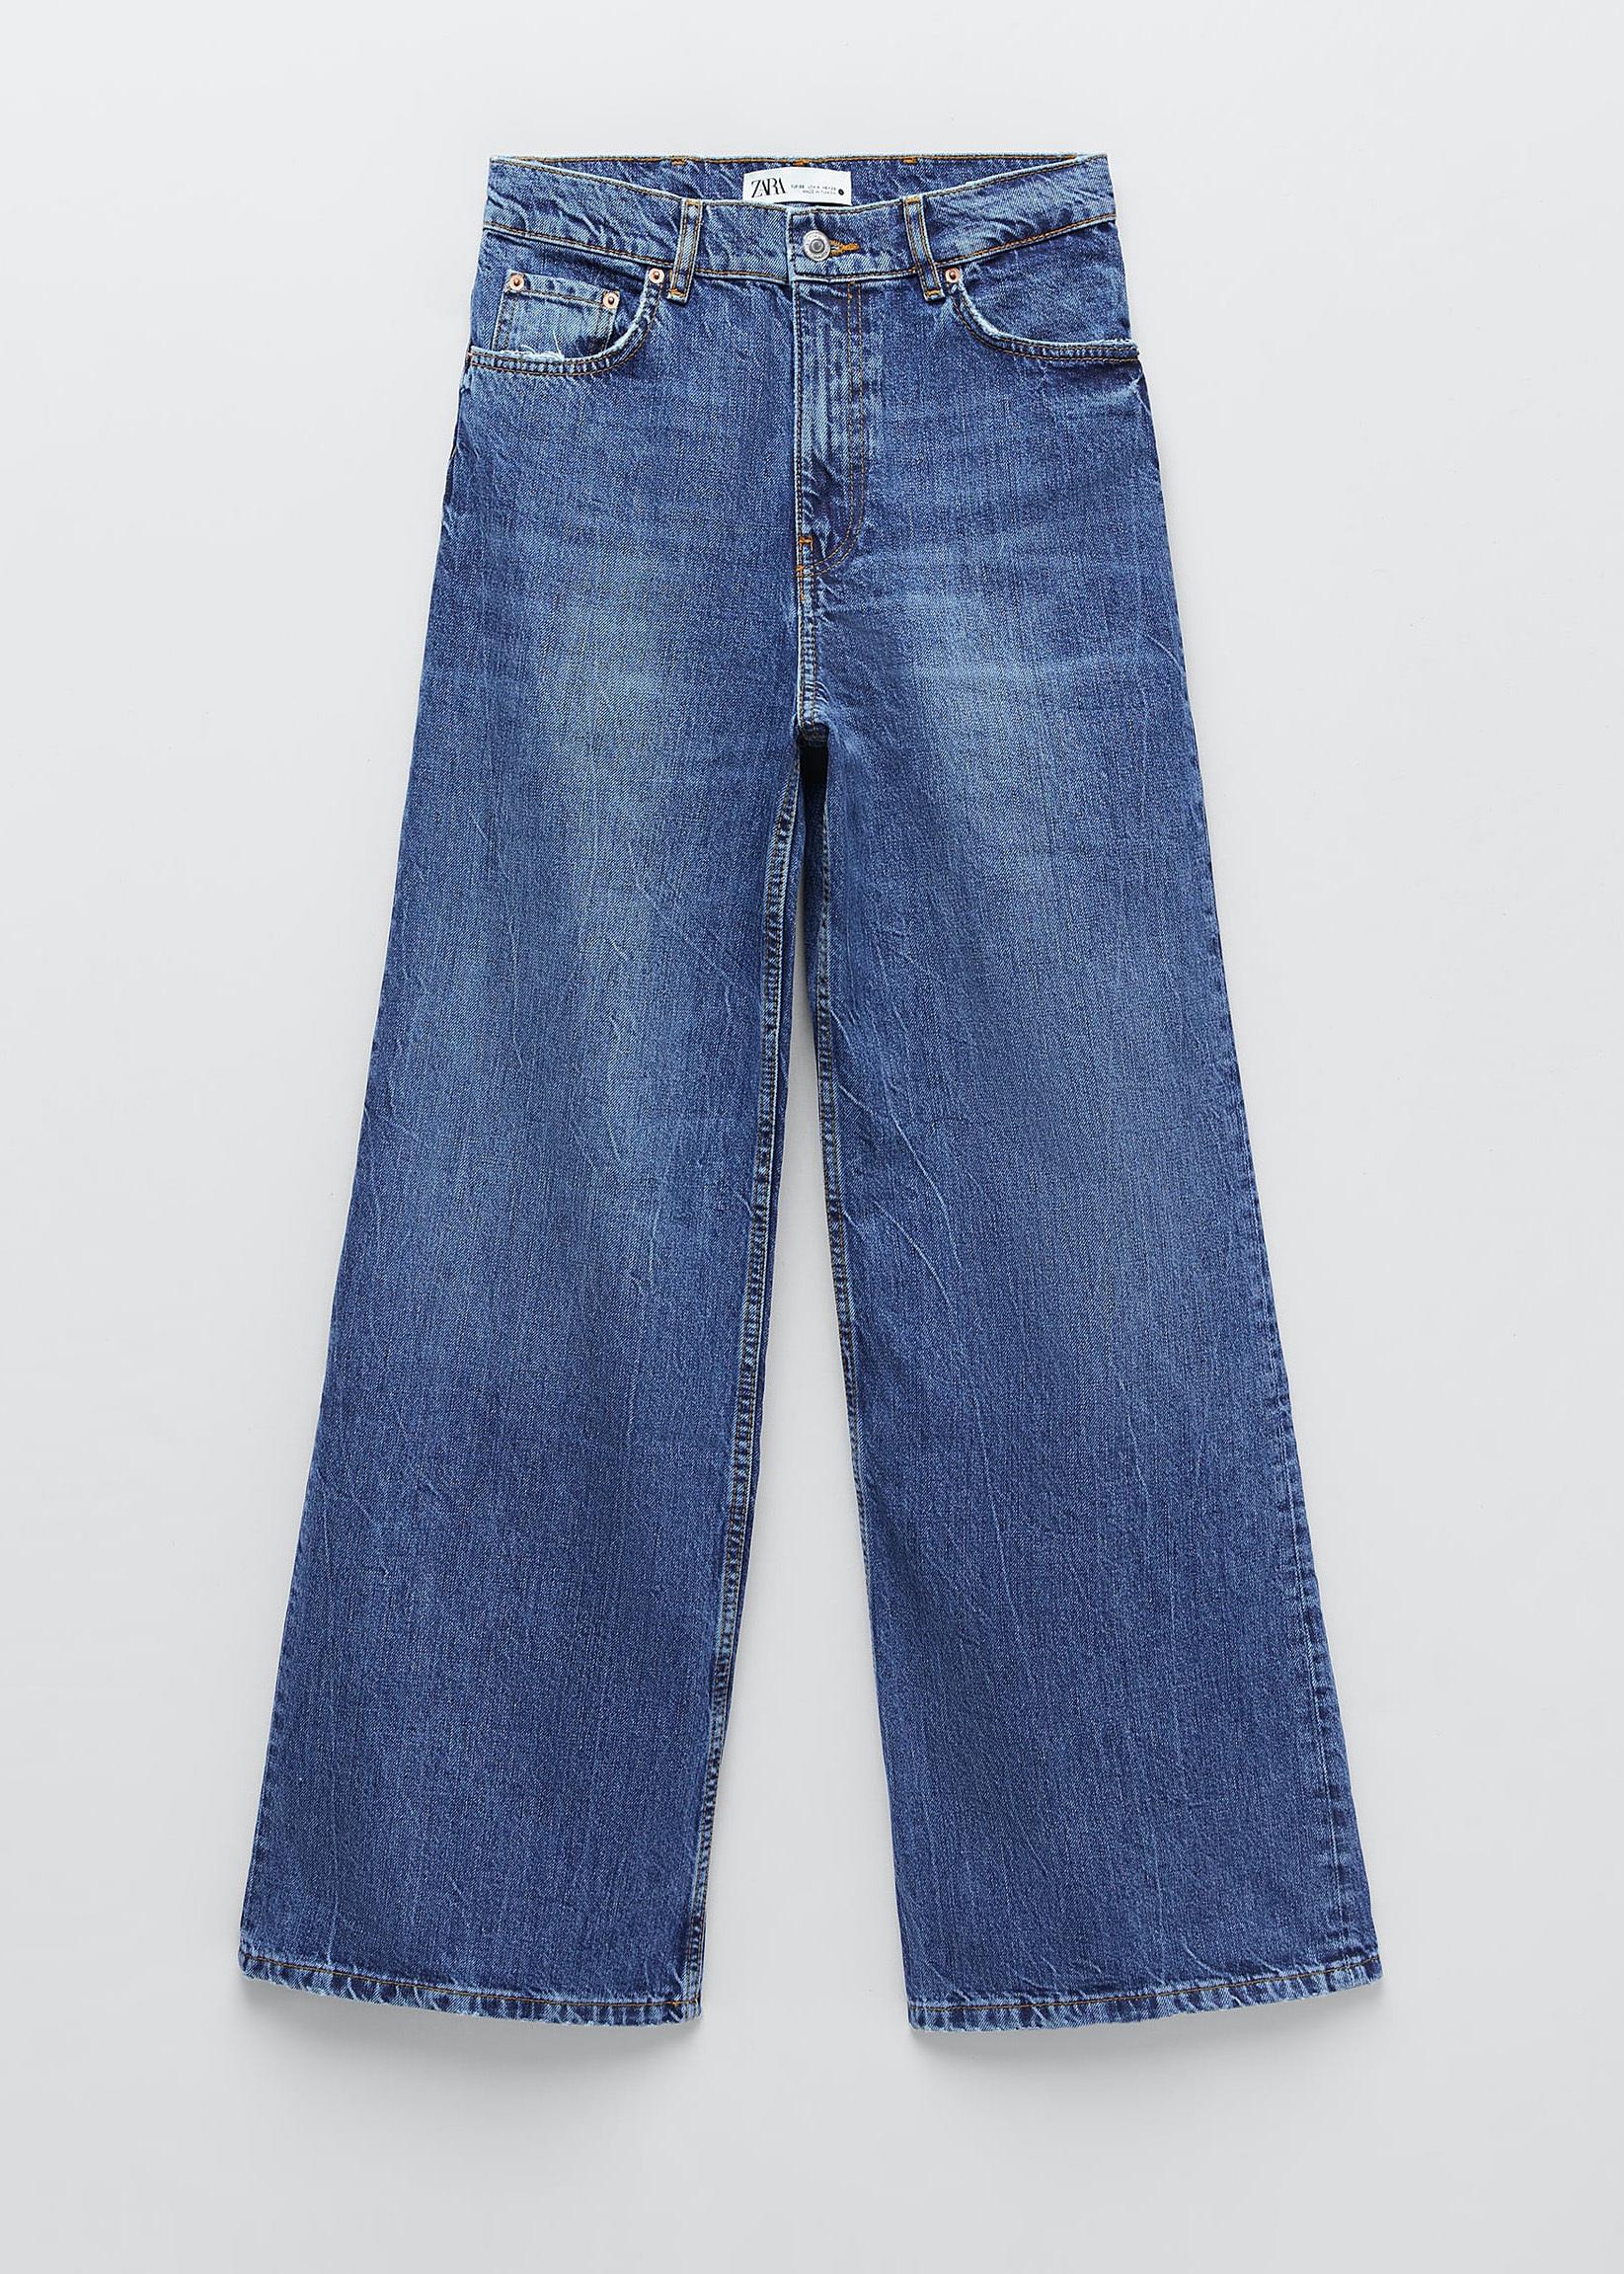 Jeans anchos de Zara.